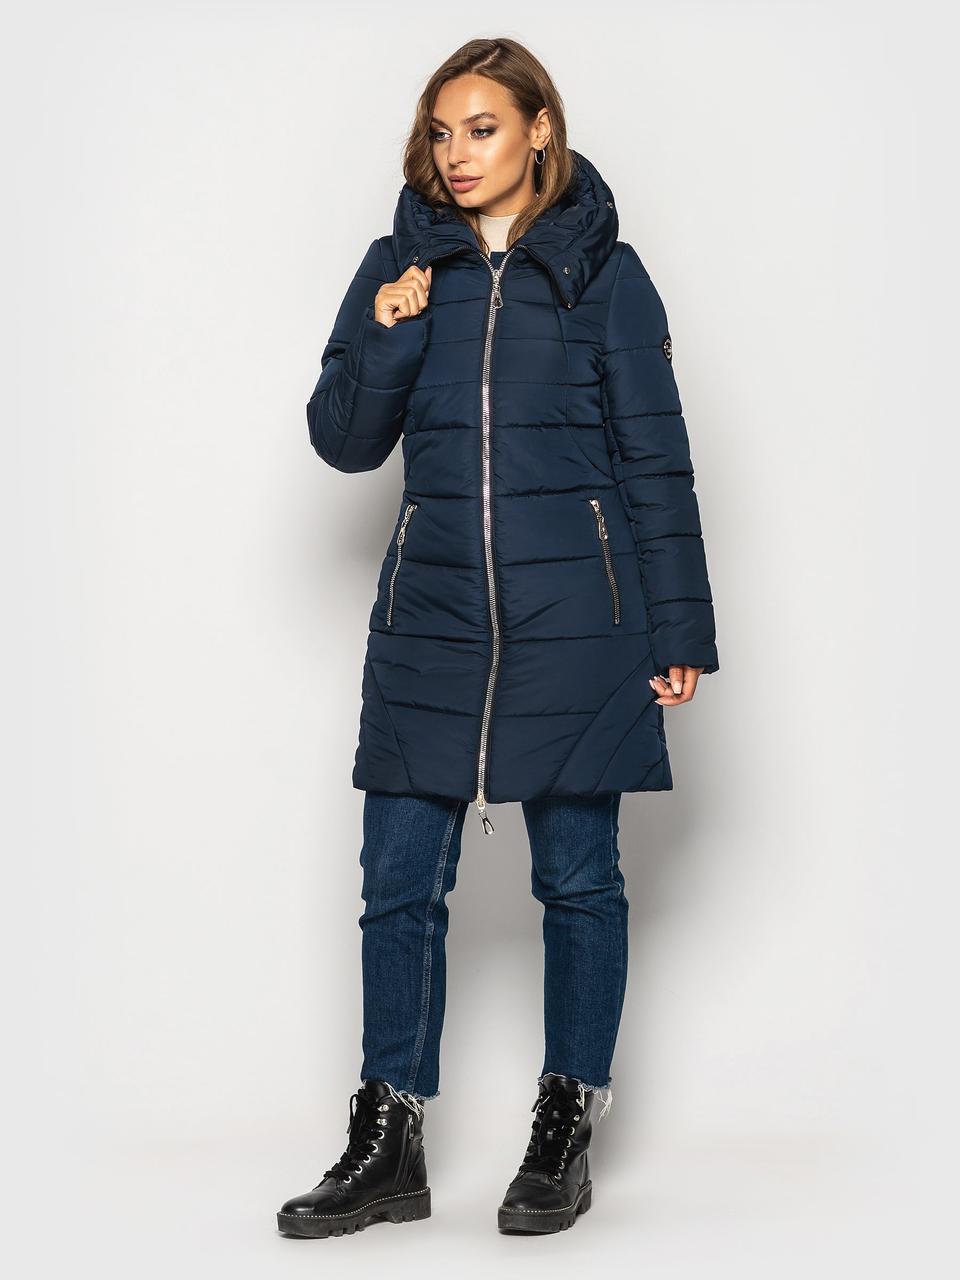 Зимняя куртка большого размера Розали синий(50-60)